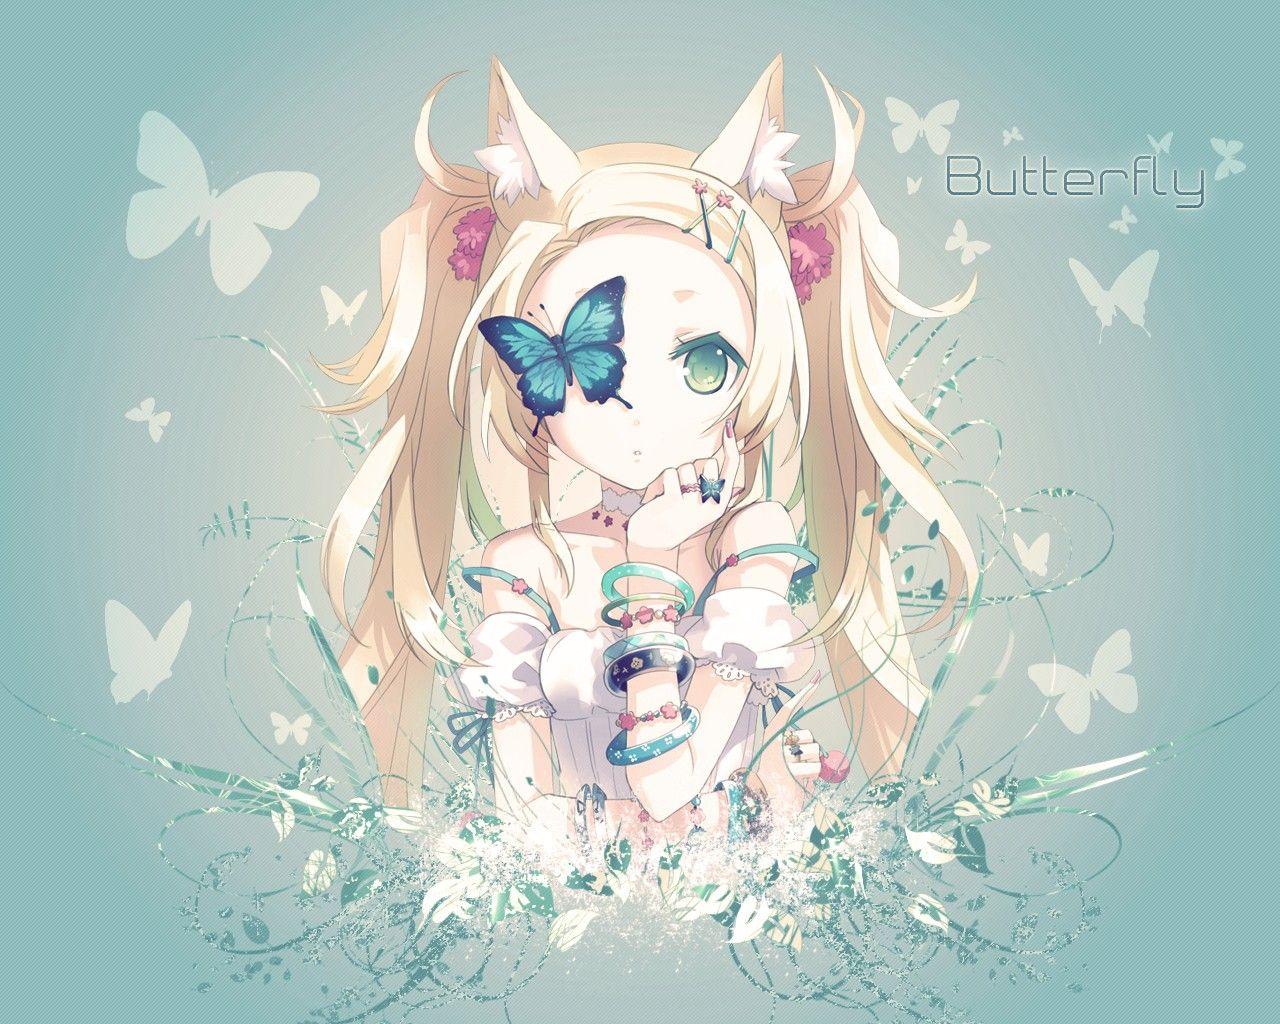 Anime game butterfly girl boys pretty wallpaper | 6060x4037 ...